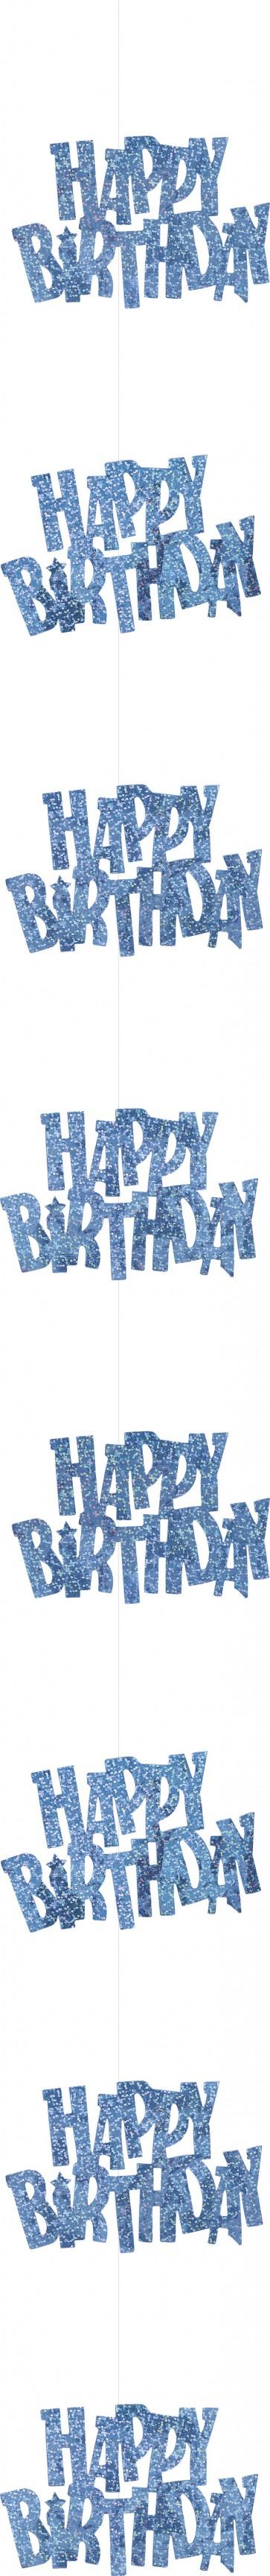 Blue Glitz Happy Birthday Hanging Decorations